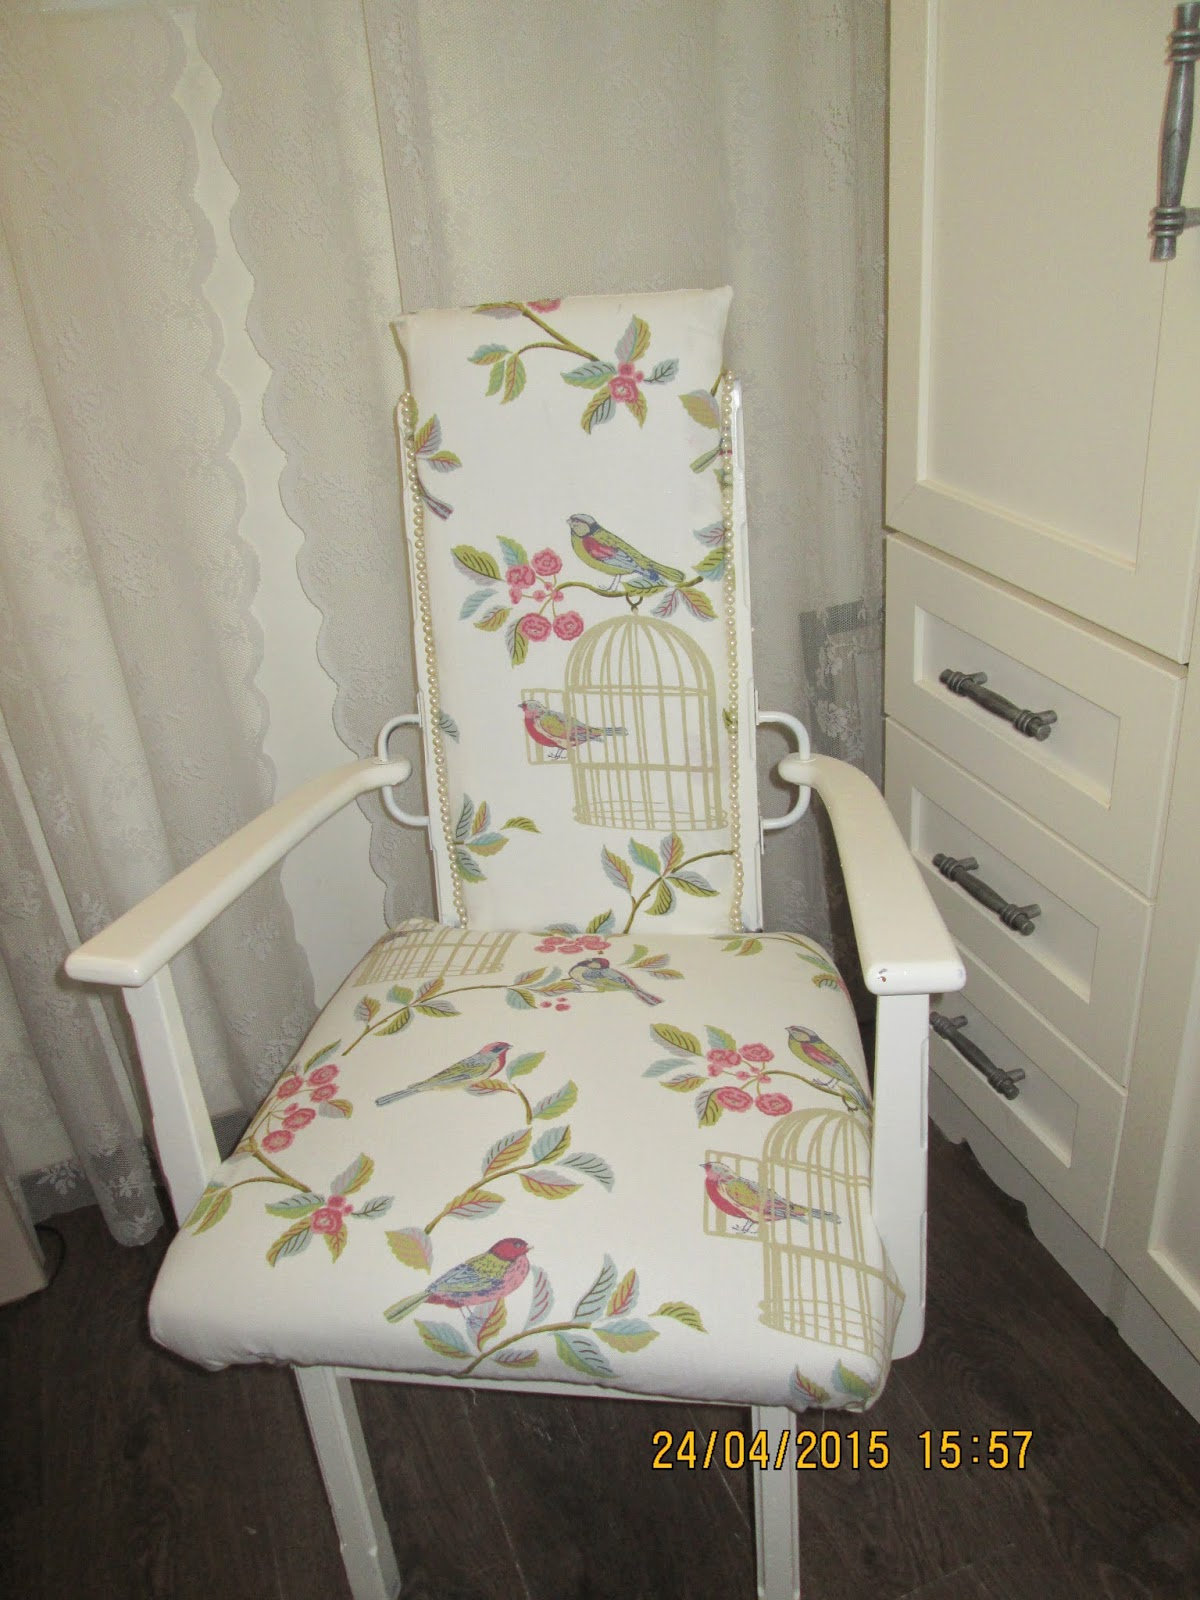 IMG 0061 - שדרוג כורסא ישנה